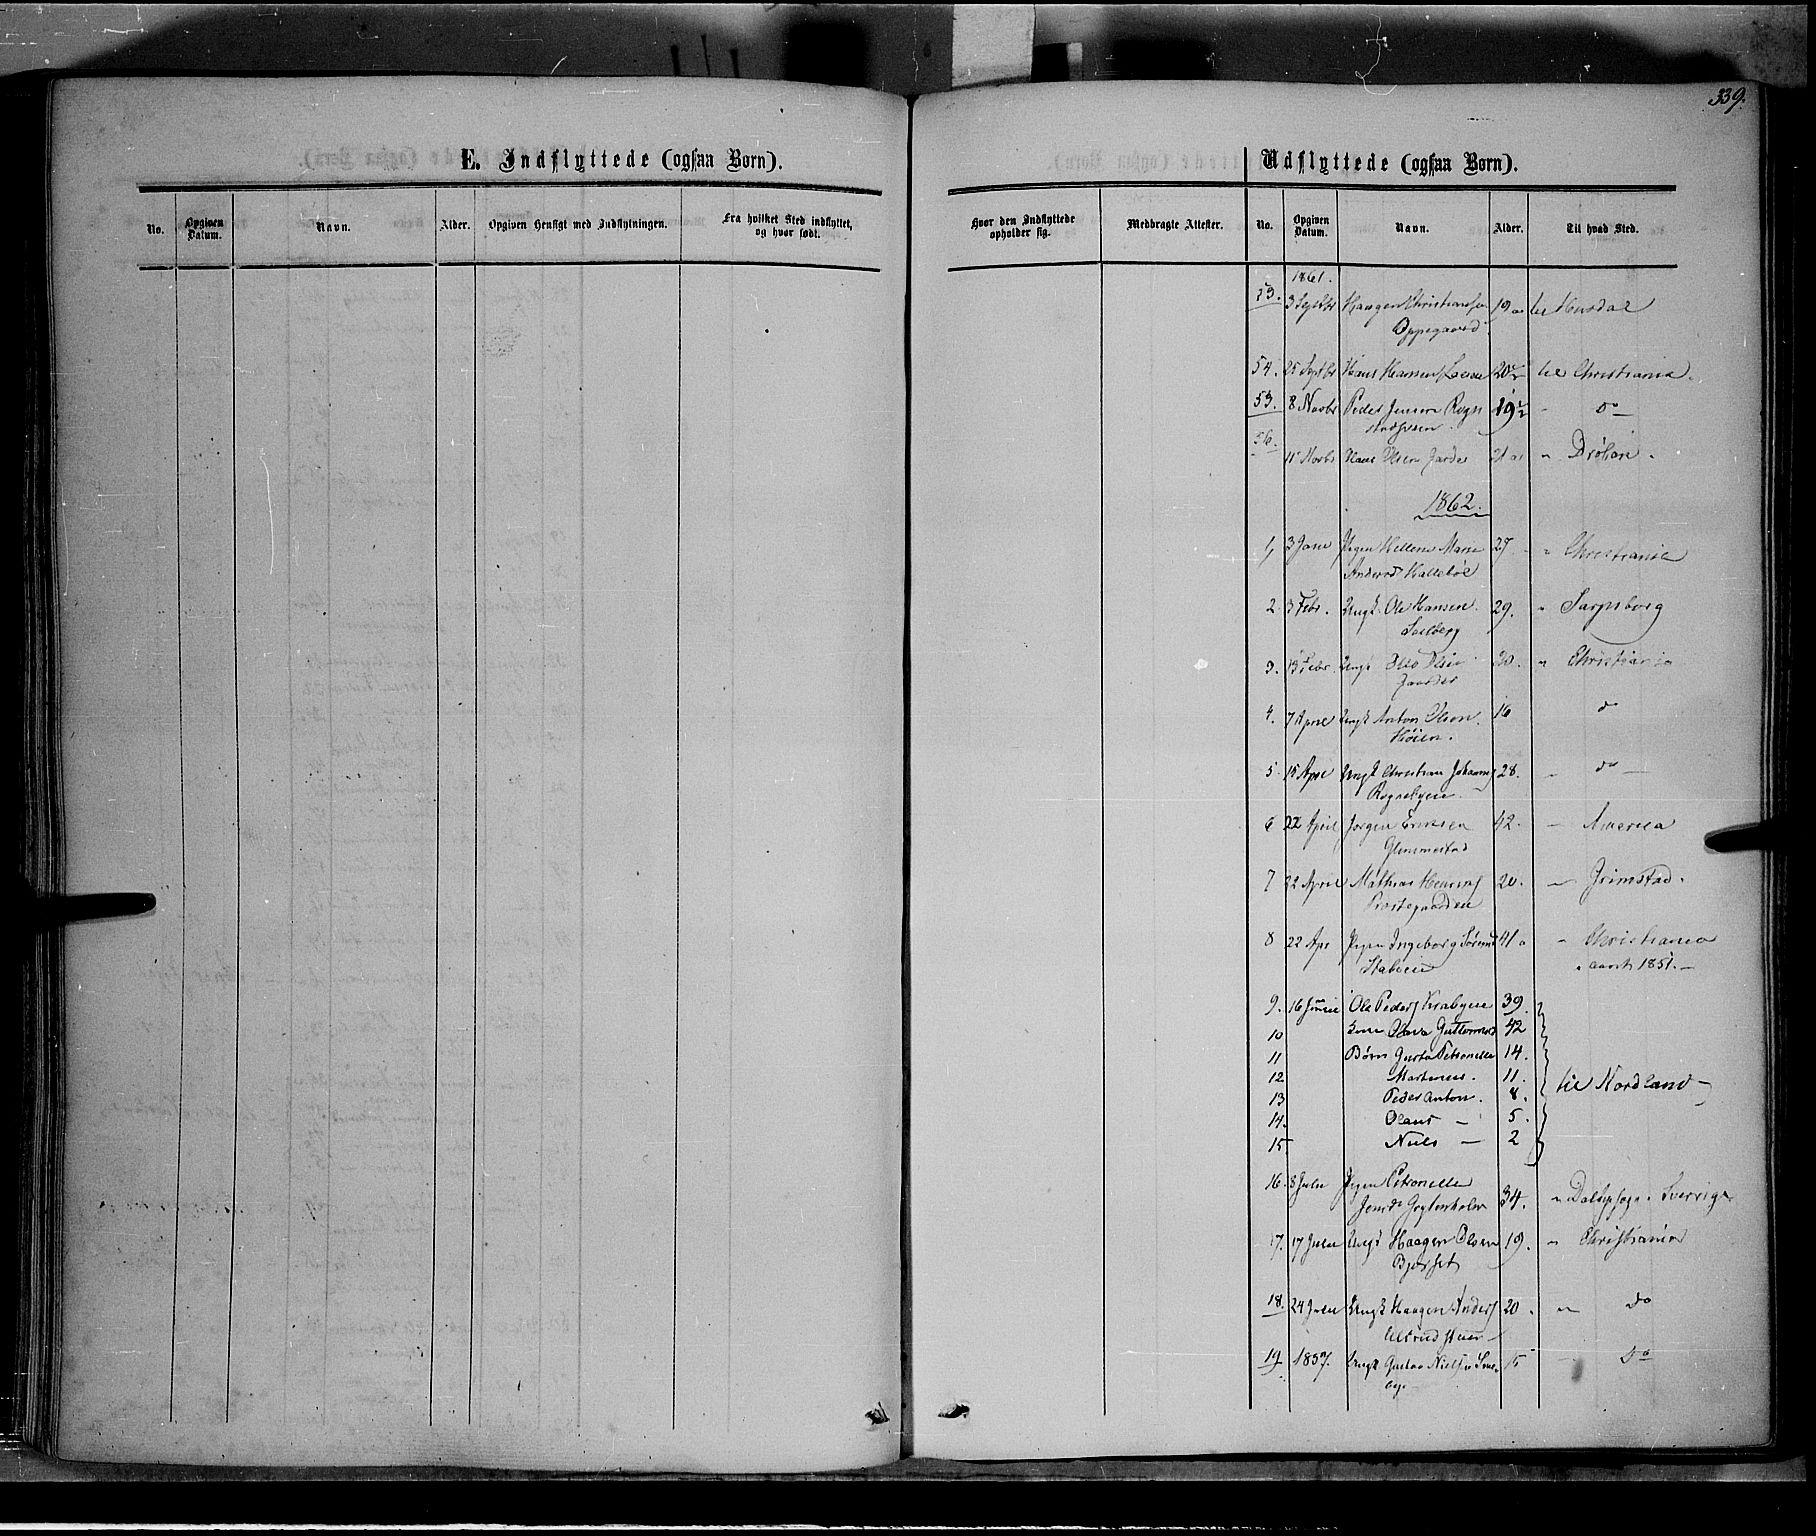 SAH, Østre Toten prestekontor, Ministerialbok nr. 4, 1857-1865, s. 339